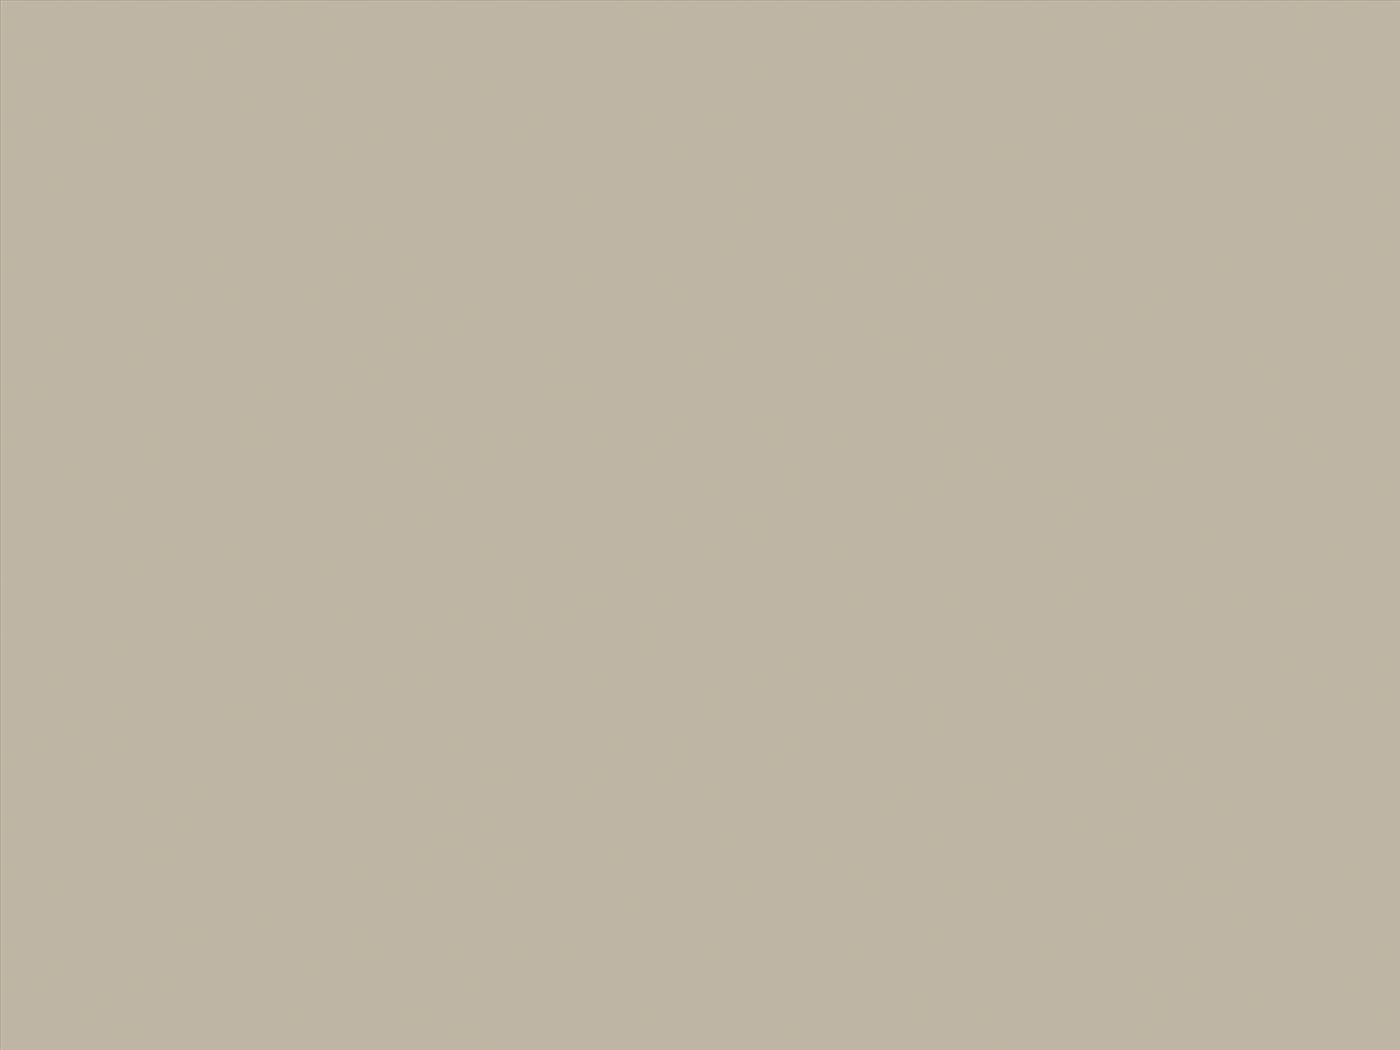 קוריאן elegant gray